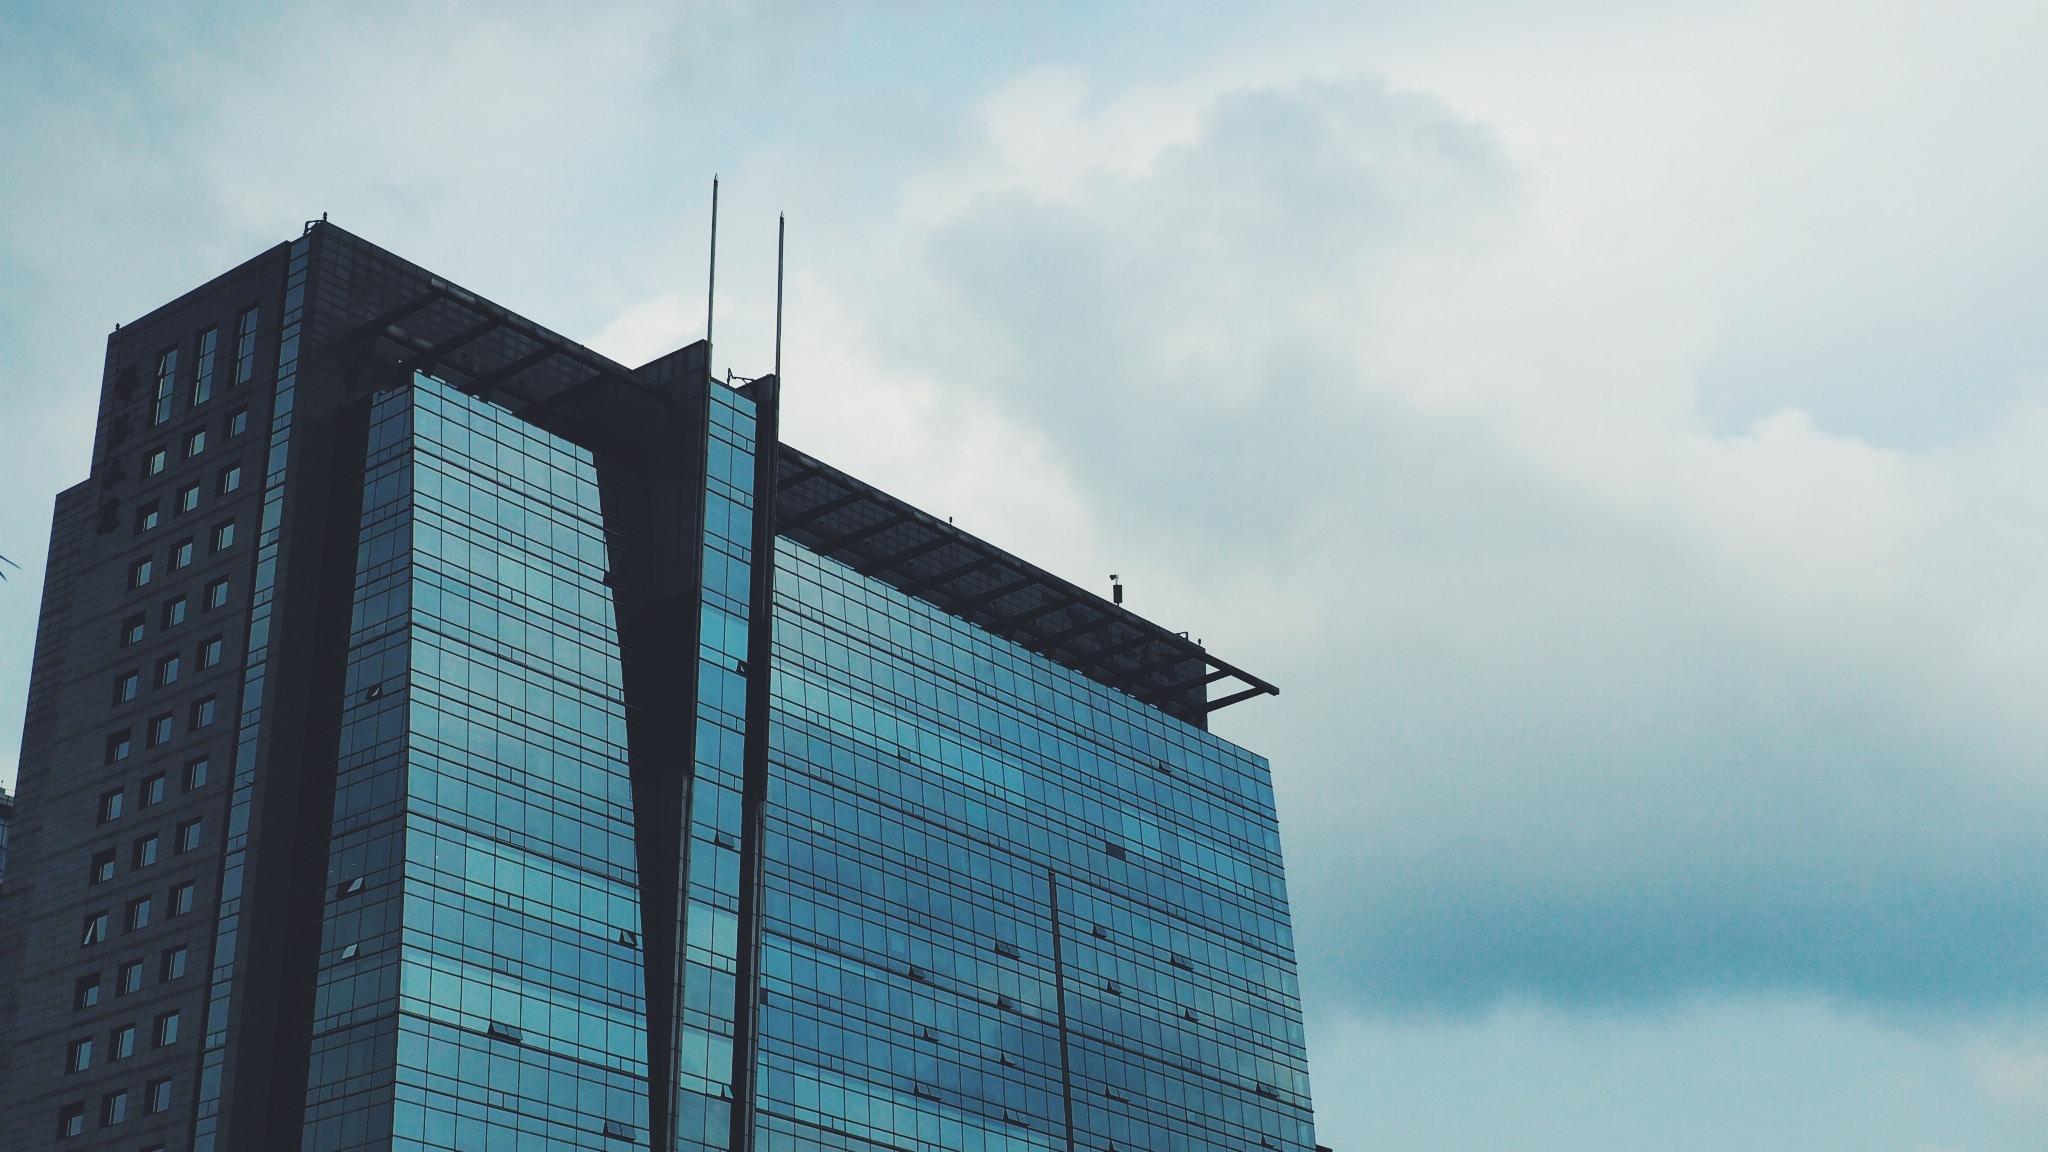 The modern glass facade of an office building under cloudy sky